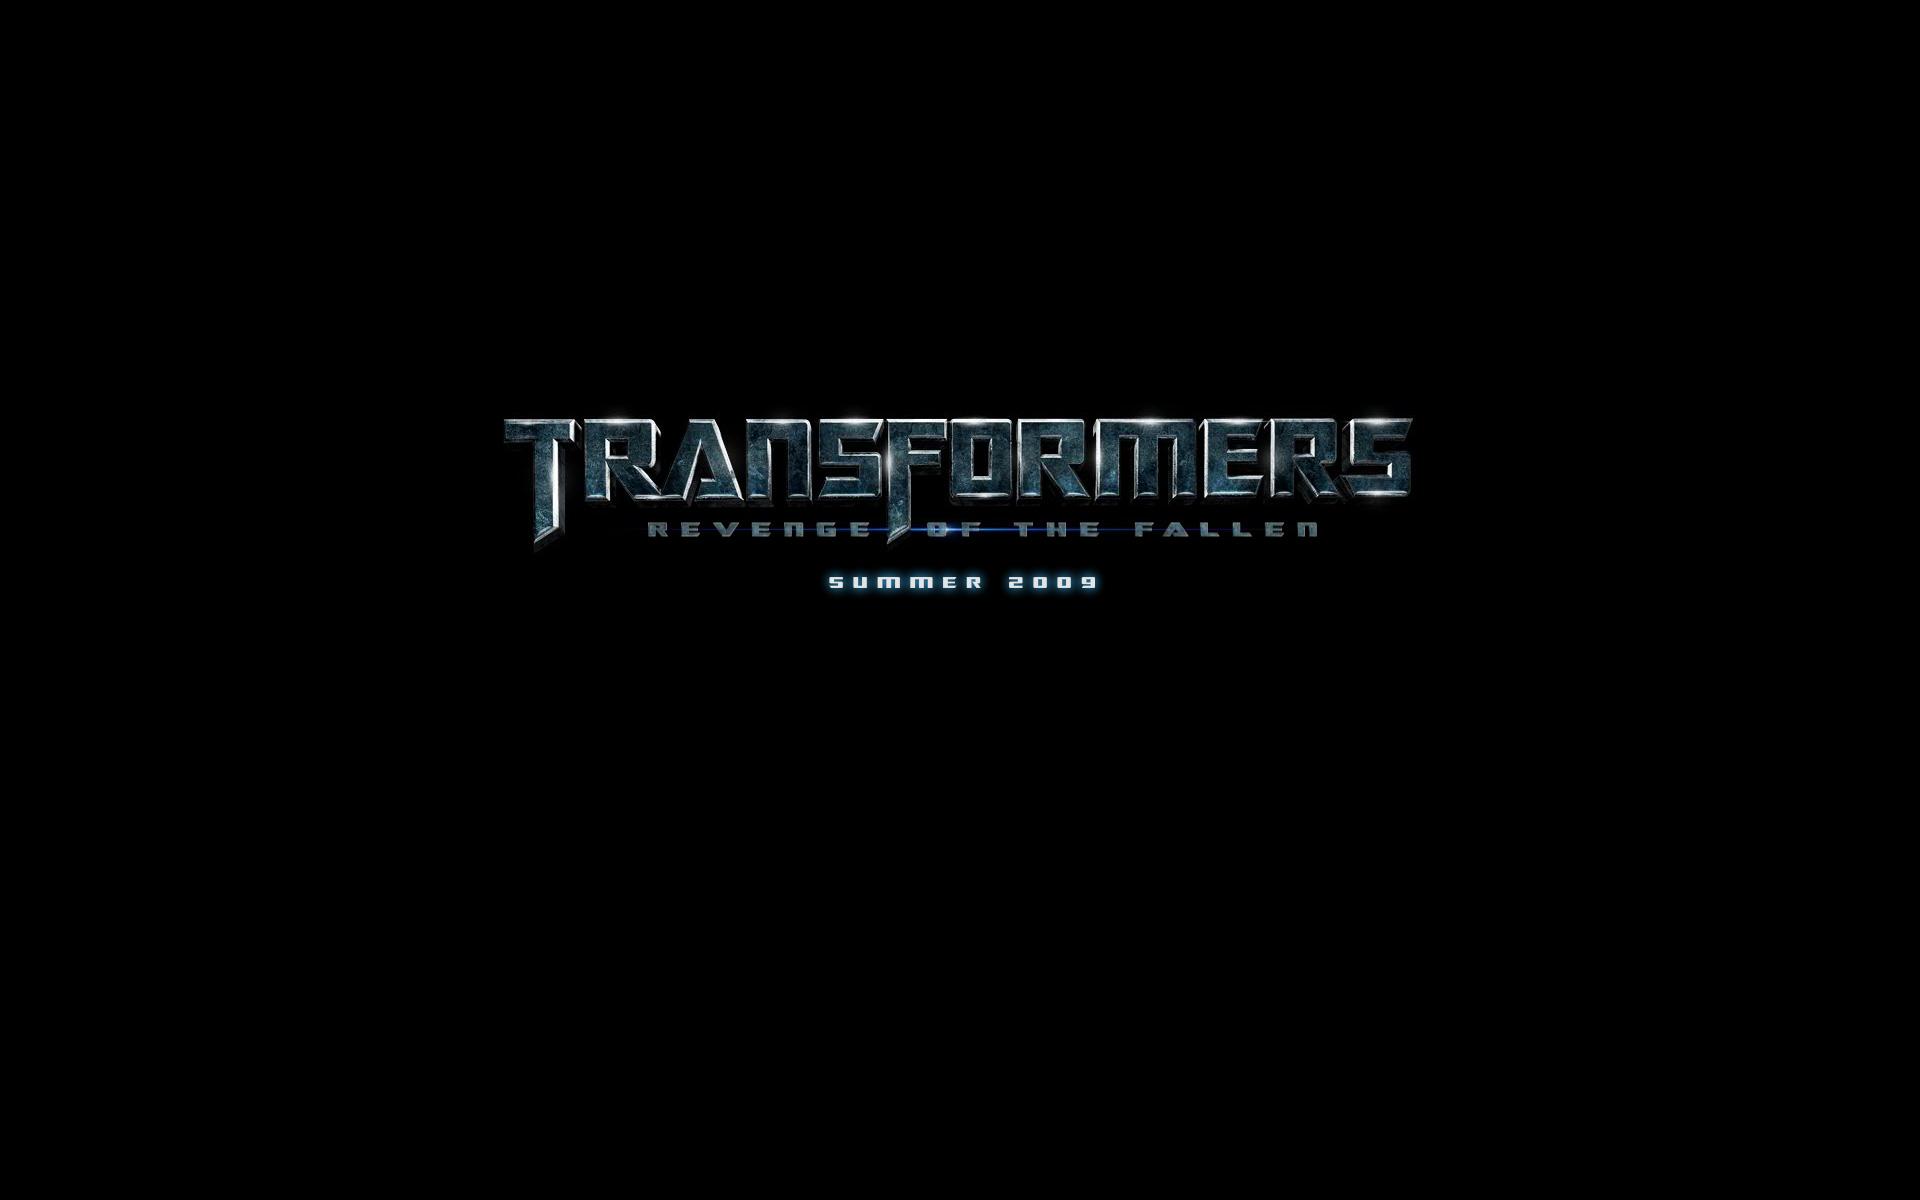 Transformers Transformers Revenge Of The Fallen Wallpaper